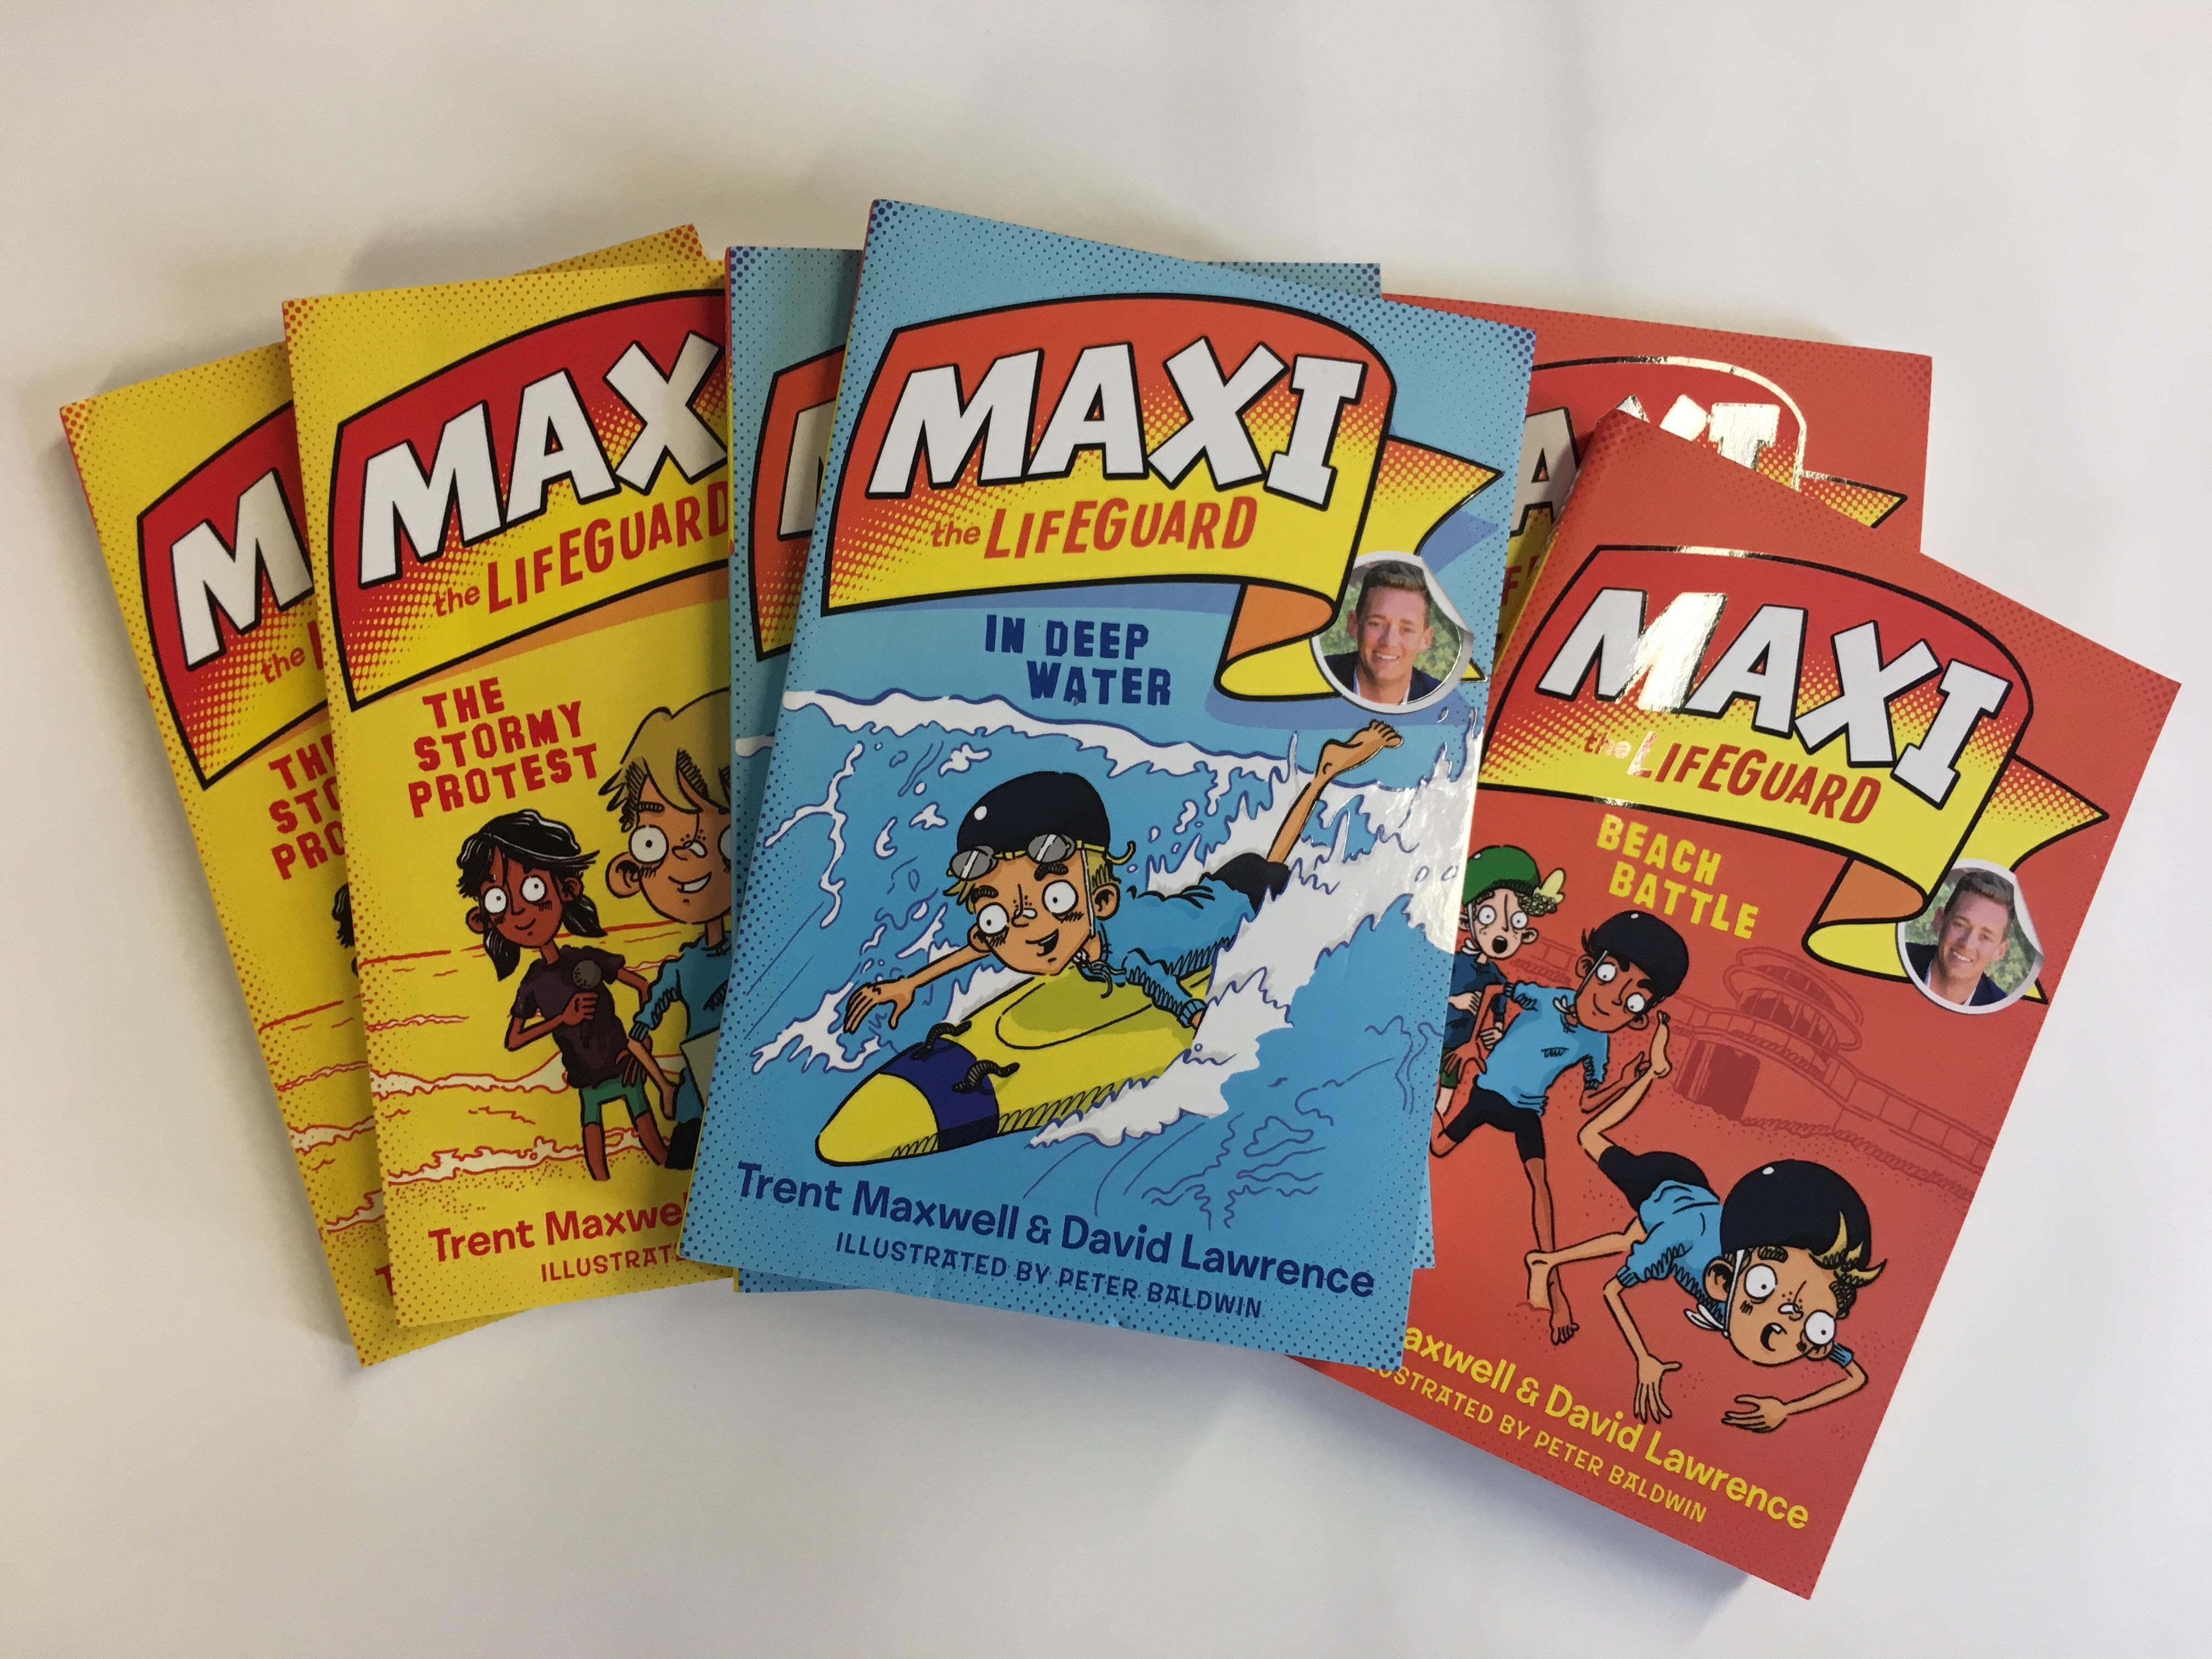 children's books on water safety stories